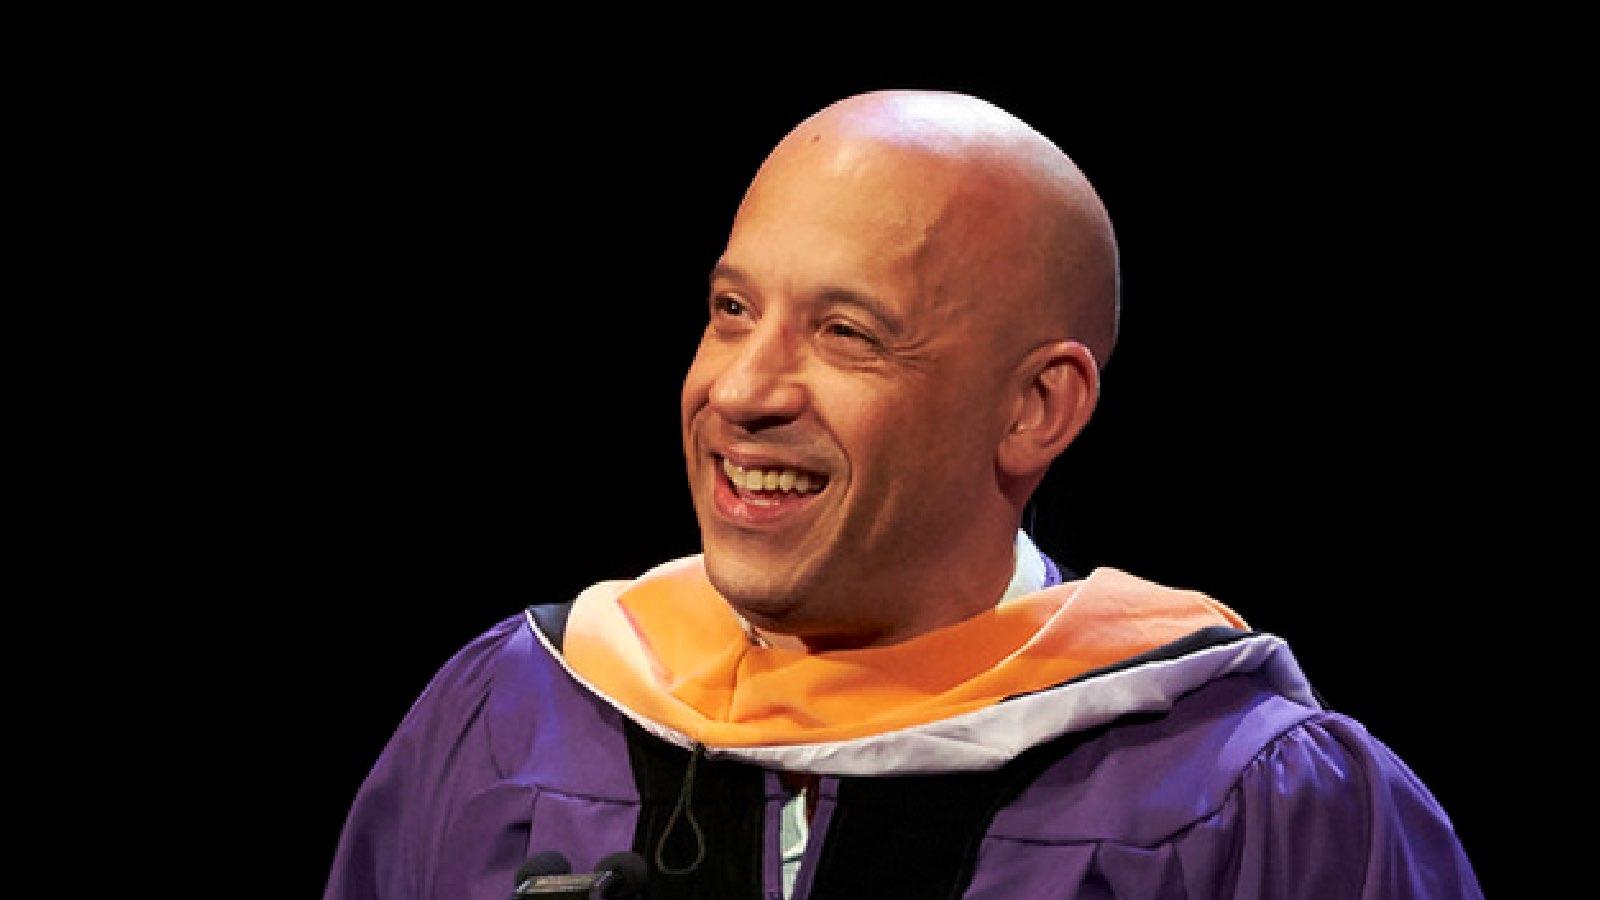 Vin Diesel giving the commencement speech